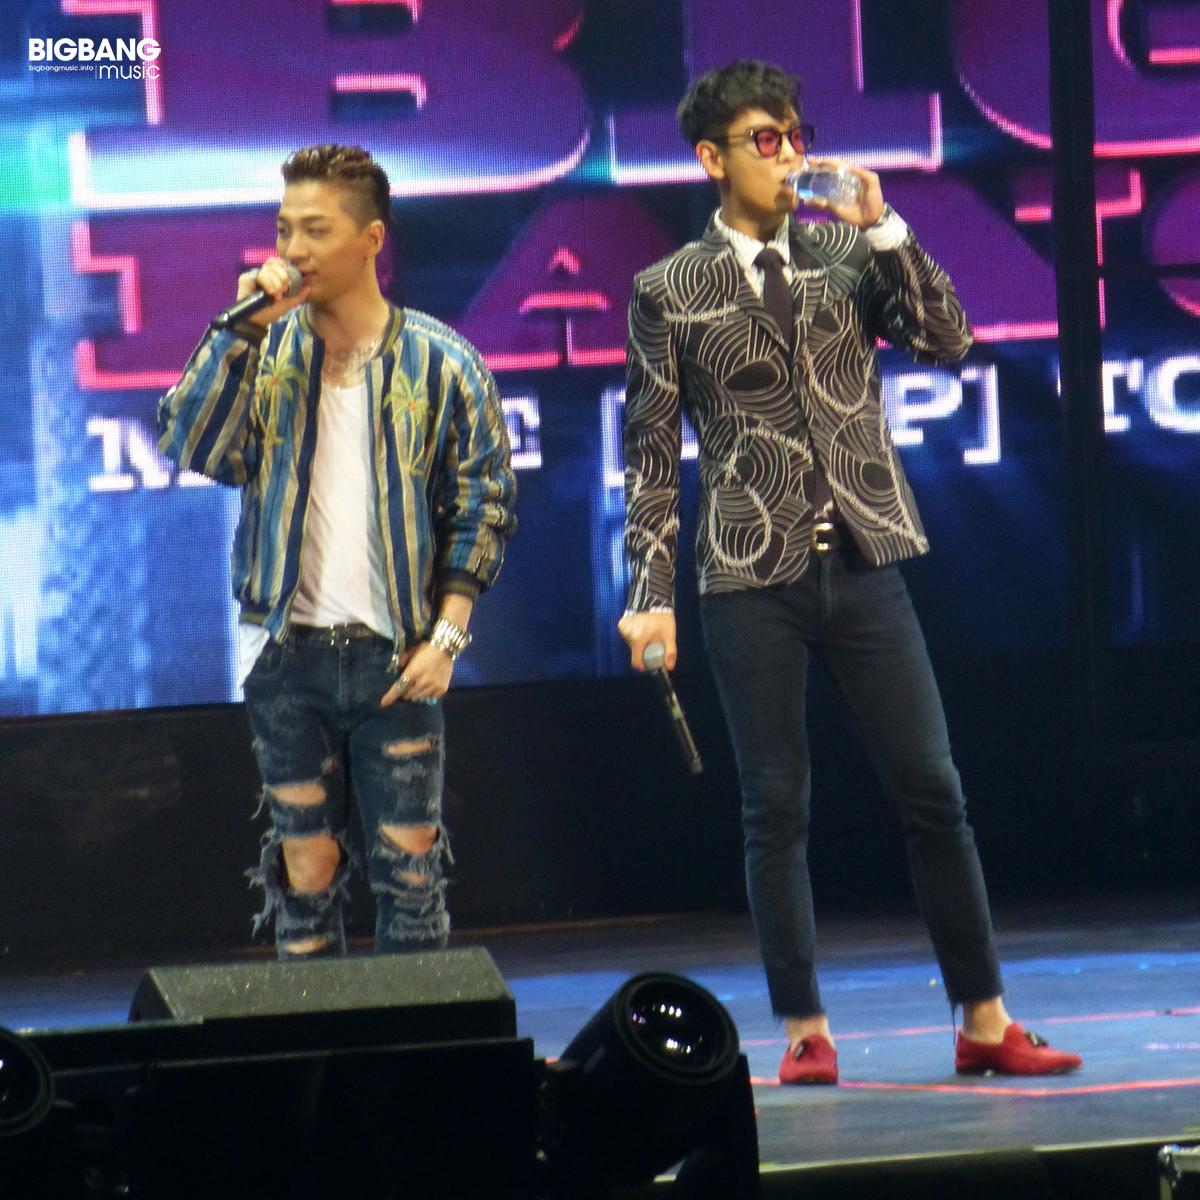 BBMusic-BIGBANG_FM_Beijing_Day3_2016-07-17_01